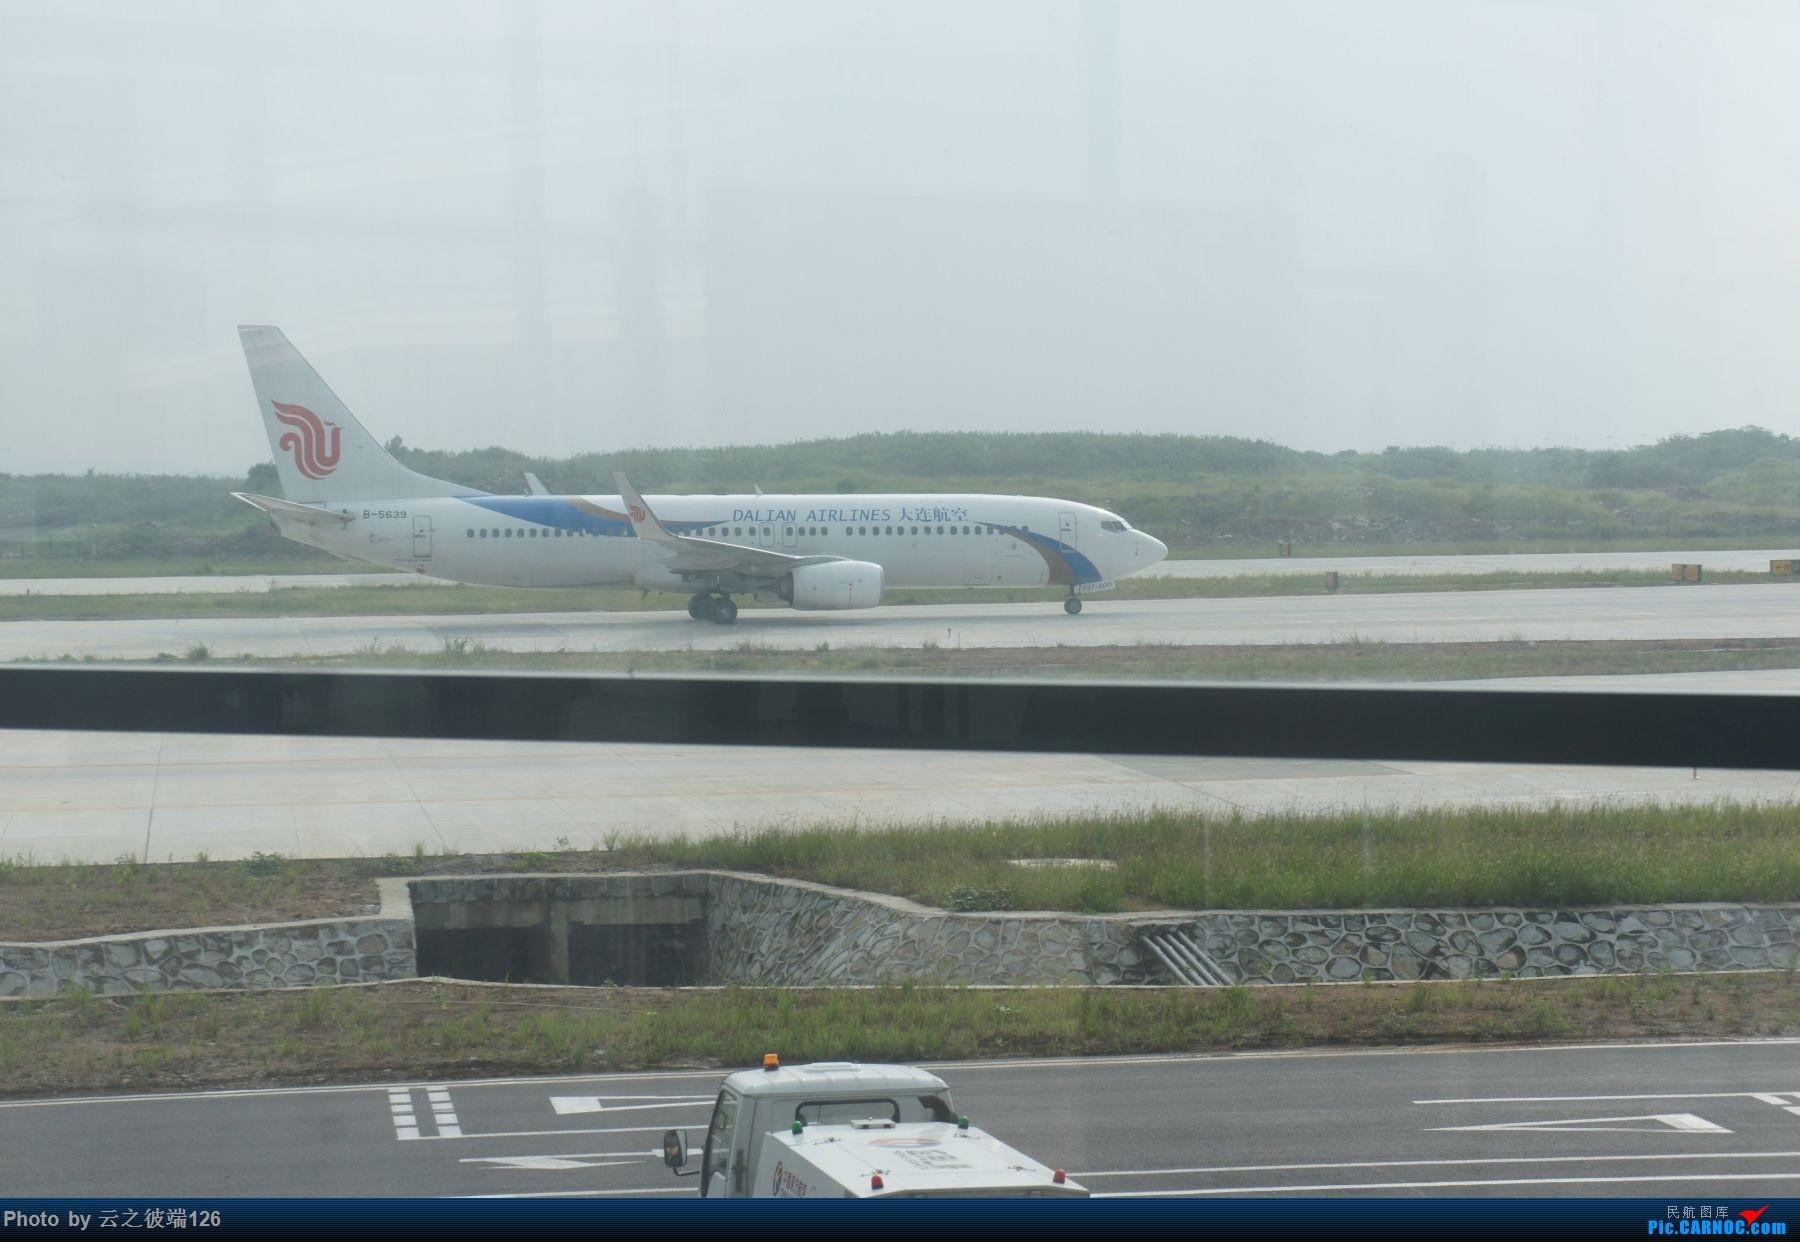 Re:[原创]迟到两年的游记 -----------NKG-SZX-NKG ZH+白菜航------ BOEING 737-800 B-5639 中国南京禄口国际机场